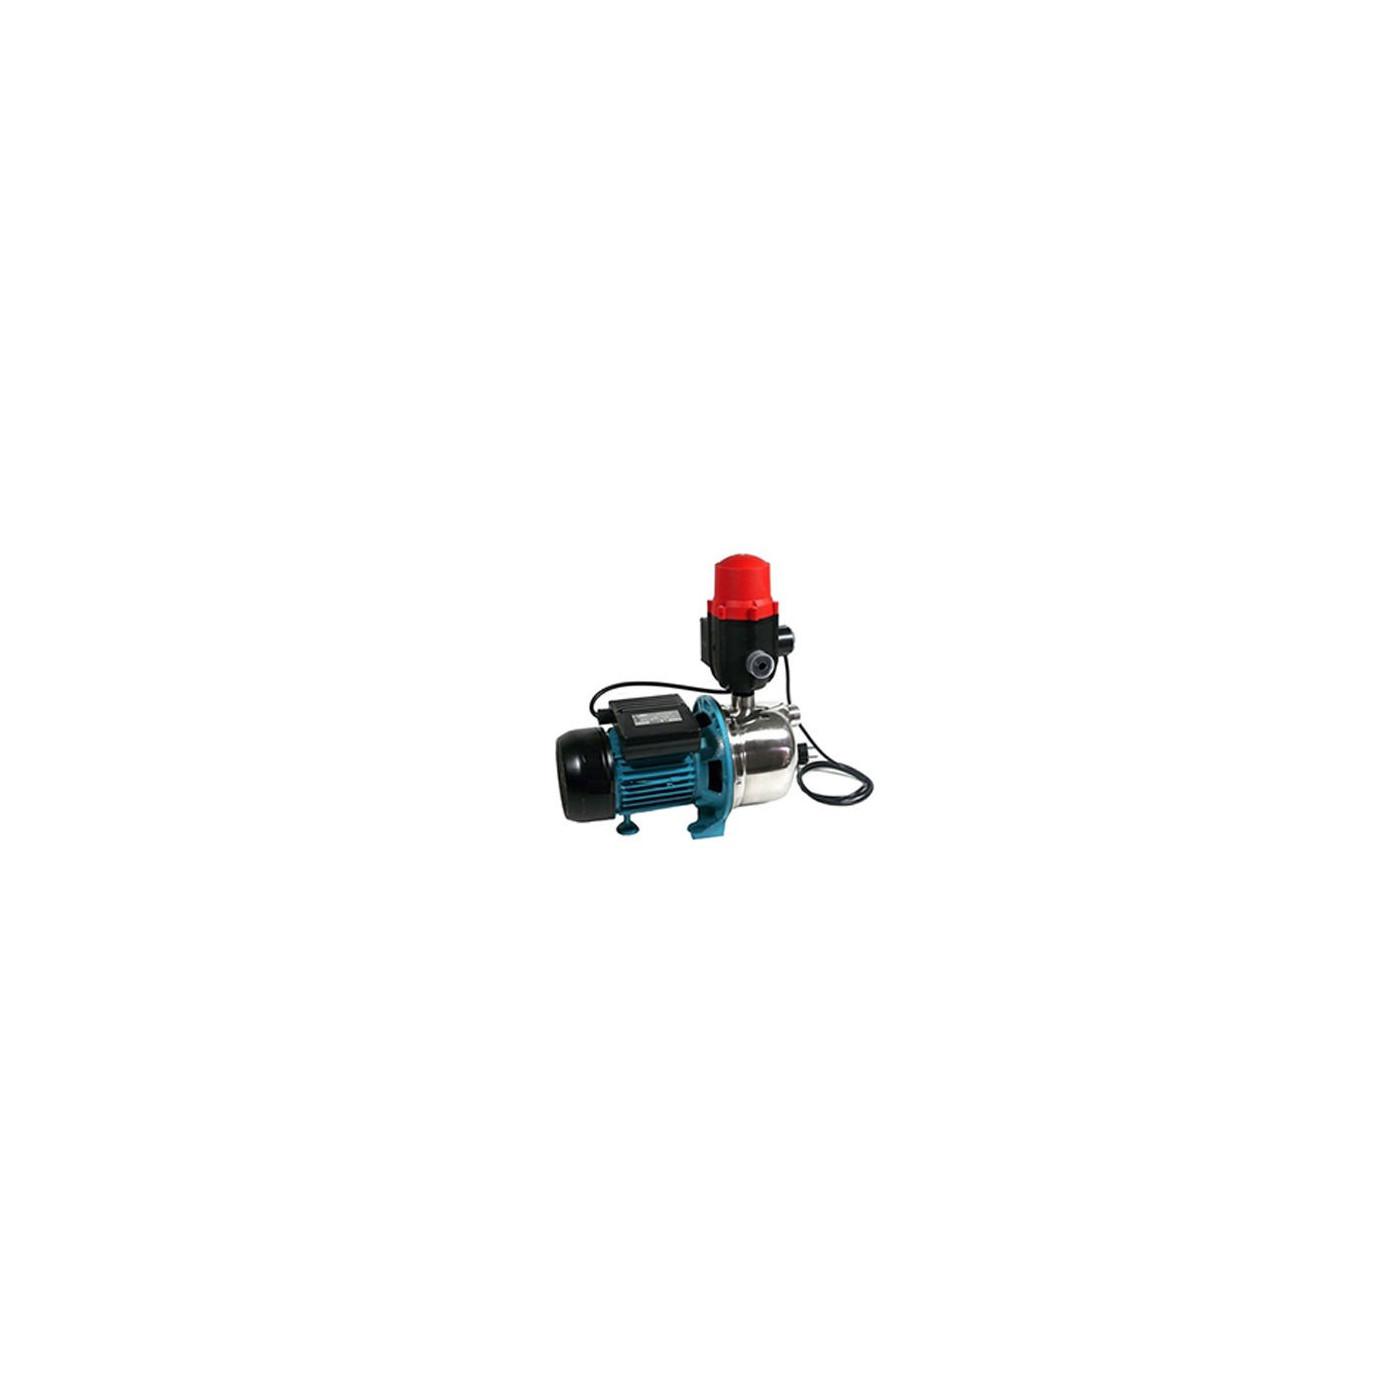 Wasserpumpe 1100W 60l/min Jetpumpe Gartenpumpe Hauswasserwerk Kreiselpumpe